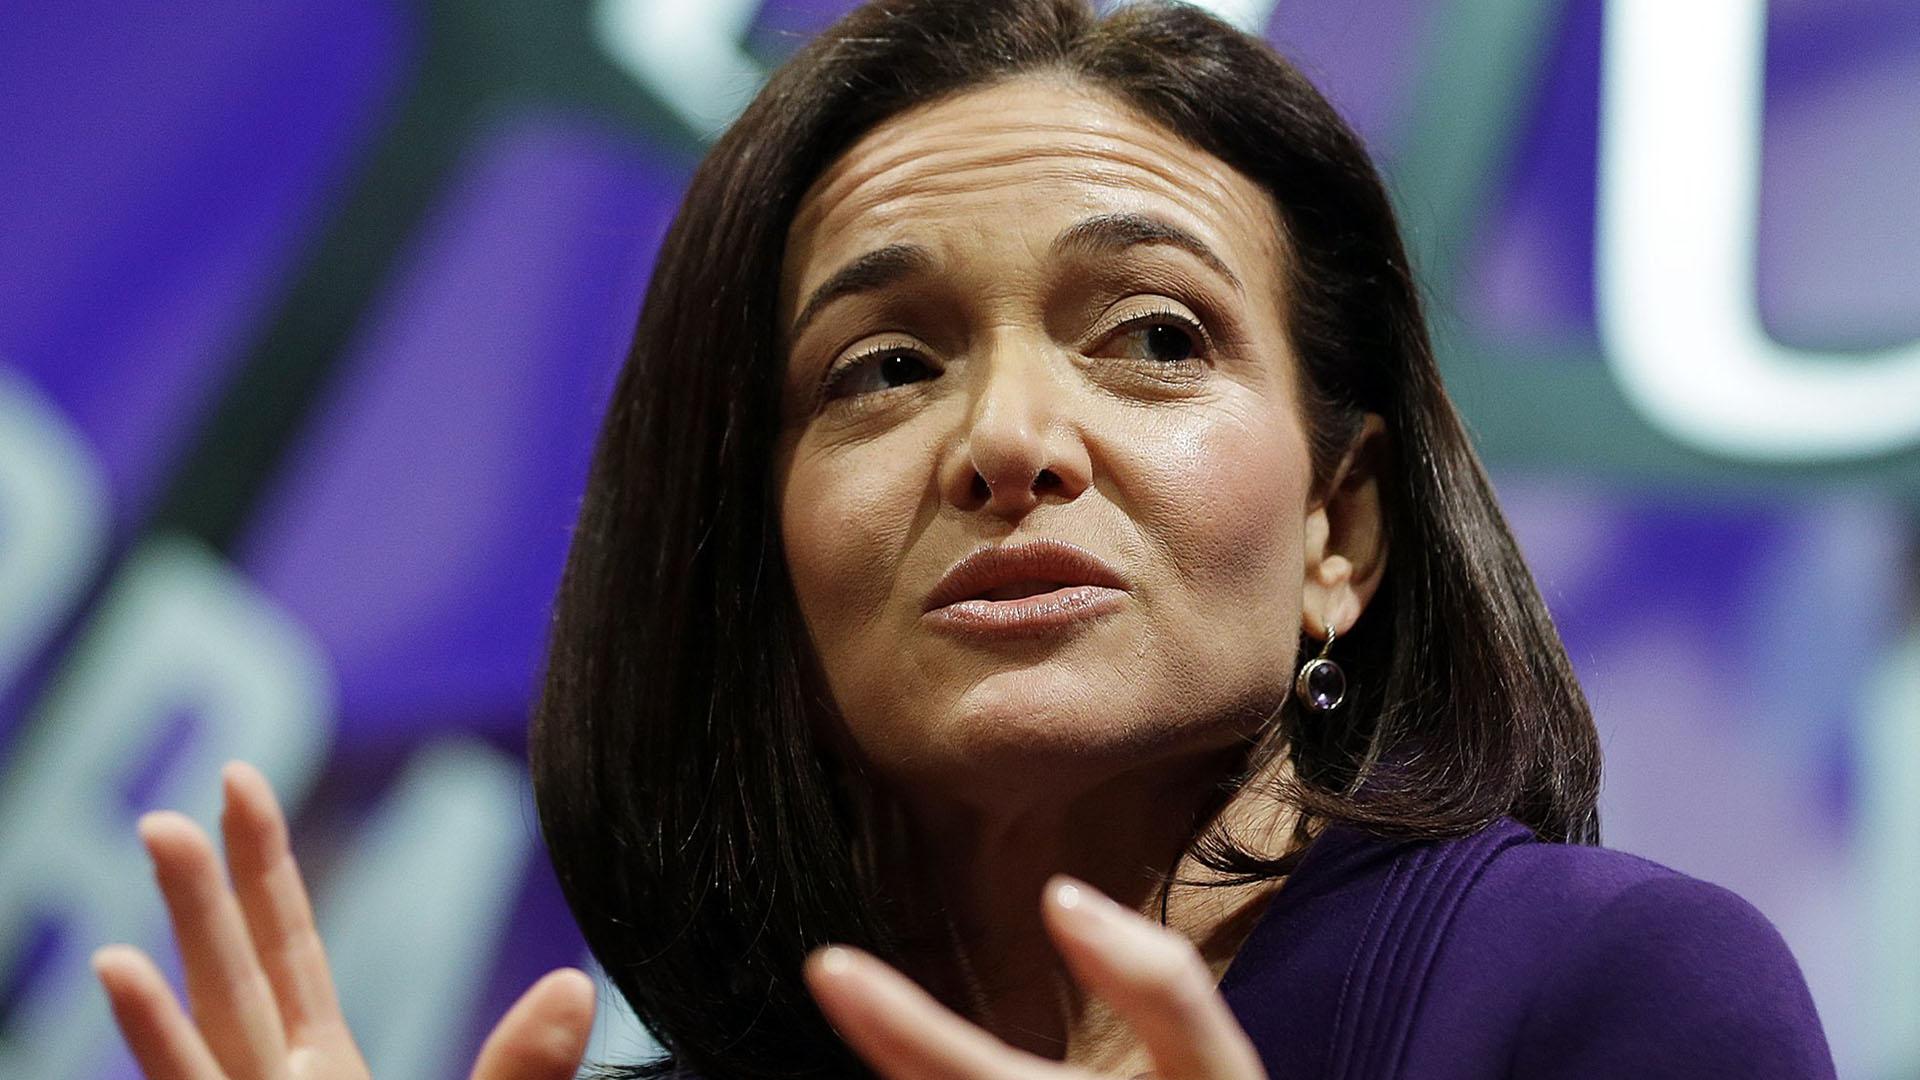 Sheryl Sandberg gives powerful UC Berkeley graduation speech - TODAY.com